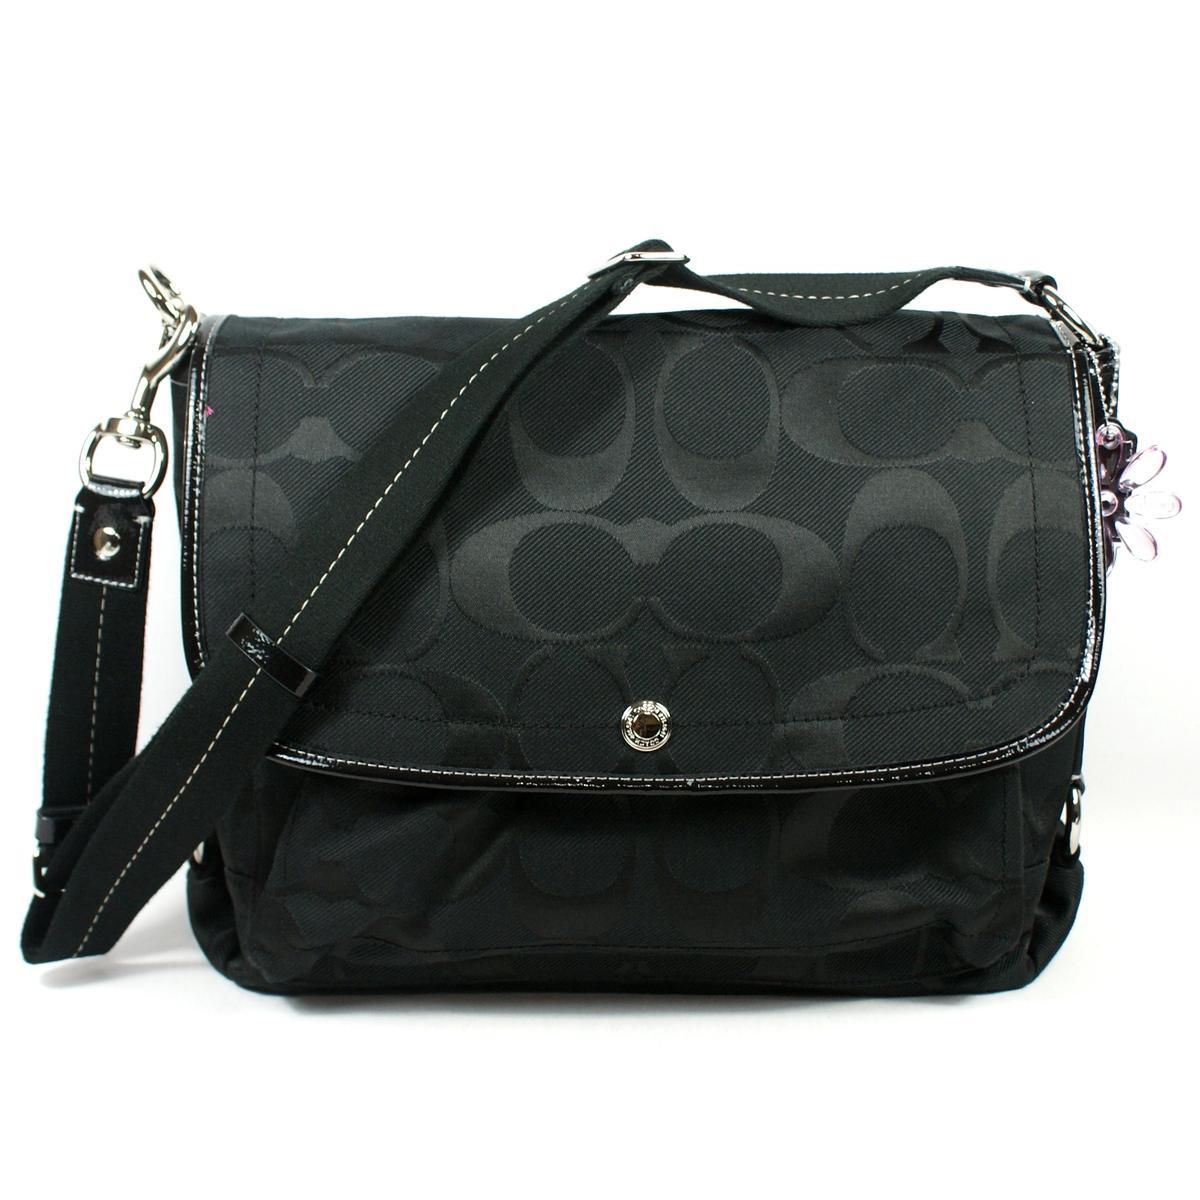 Coach Daisy Nylon Signature Messenger Bag Laptop Bag